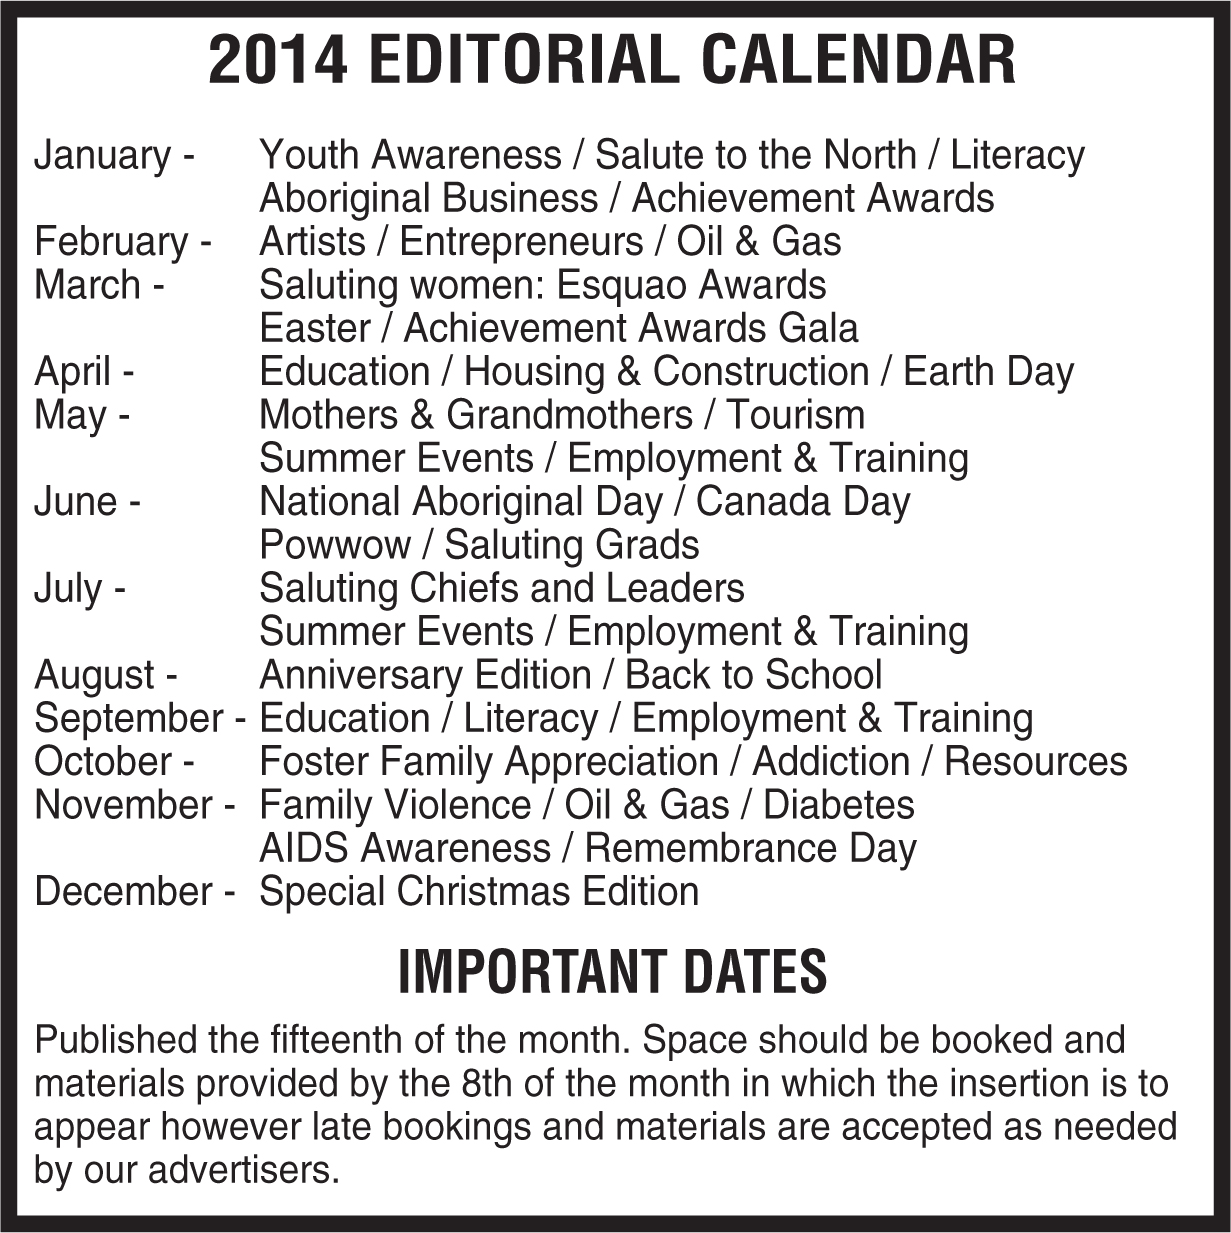 2014 editorial calendar